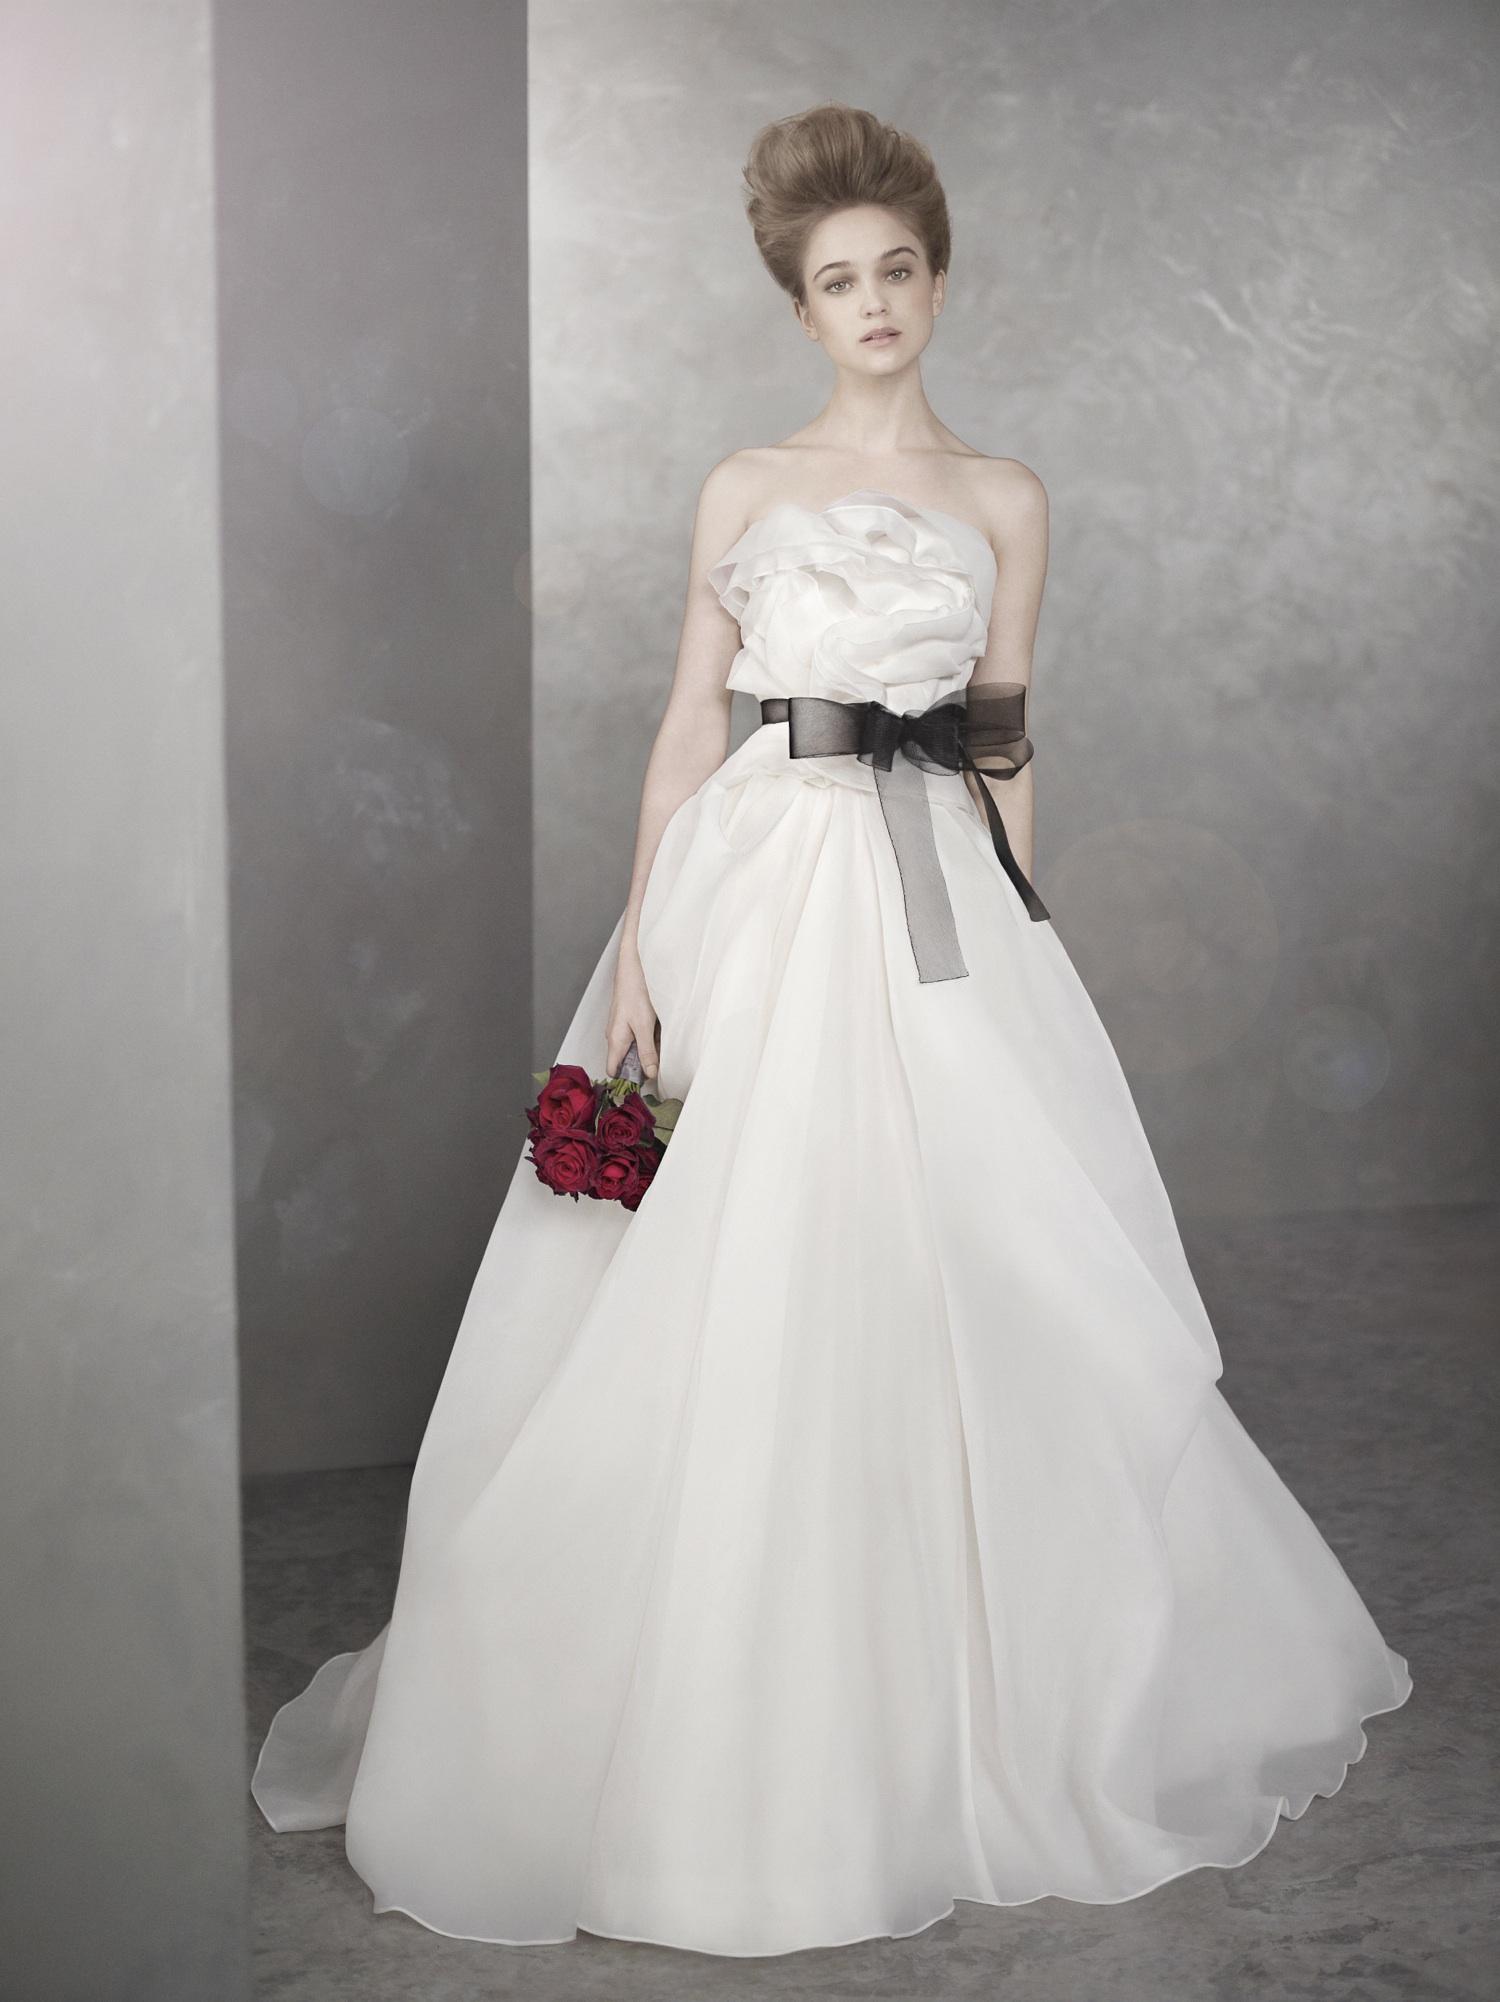 Vera Wang Wedding Dress 2012 – images free download